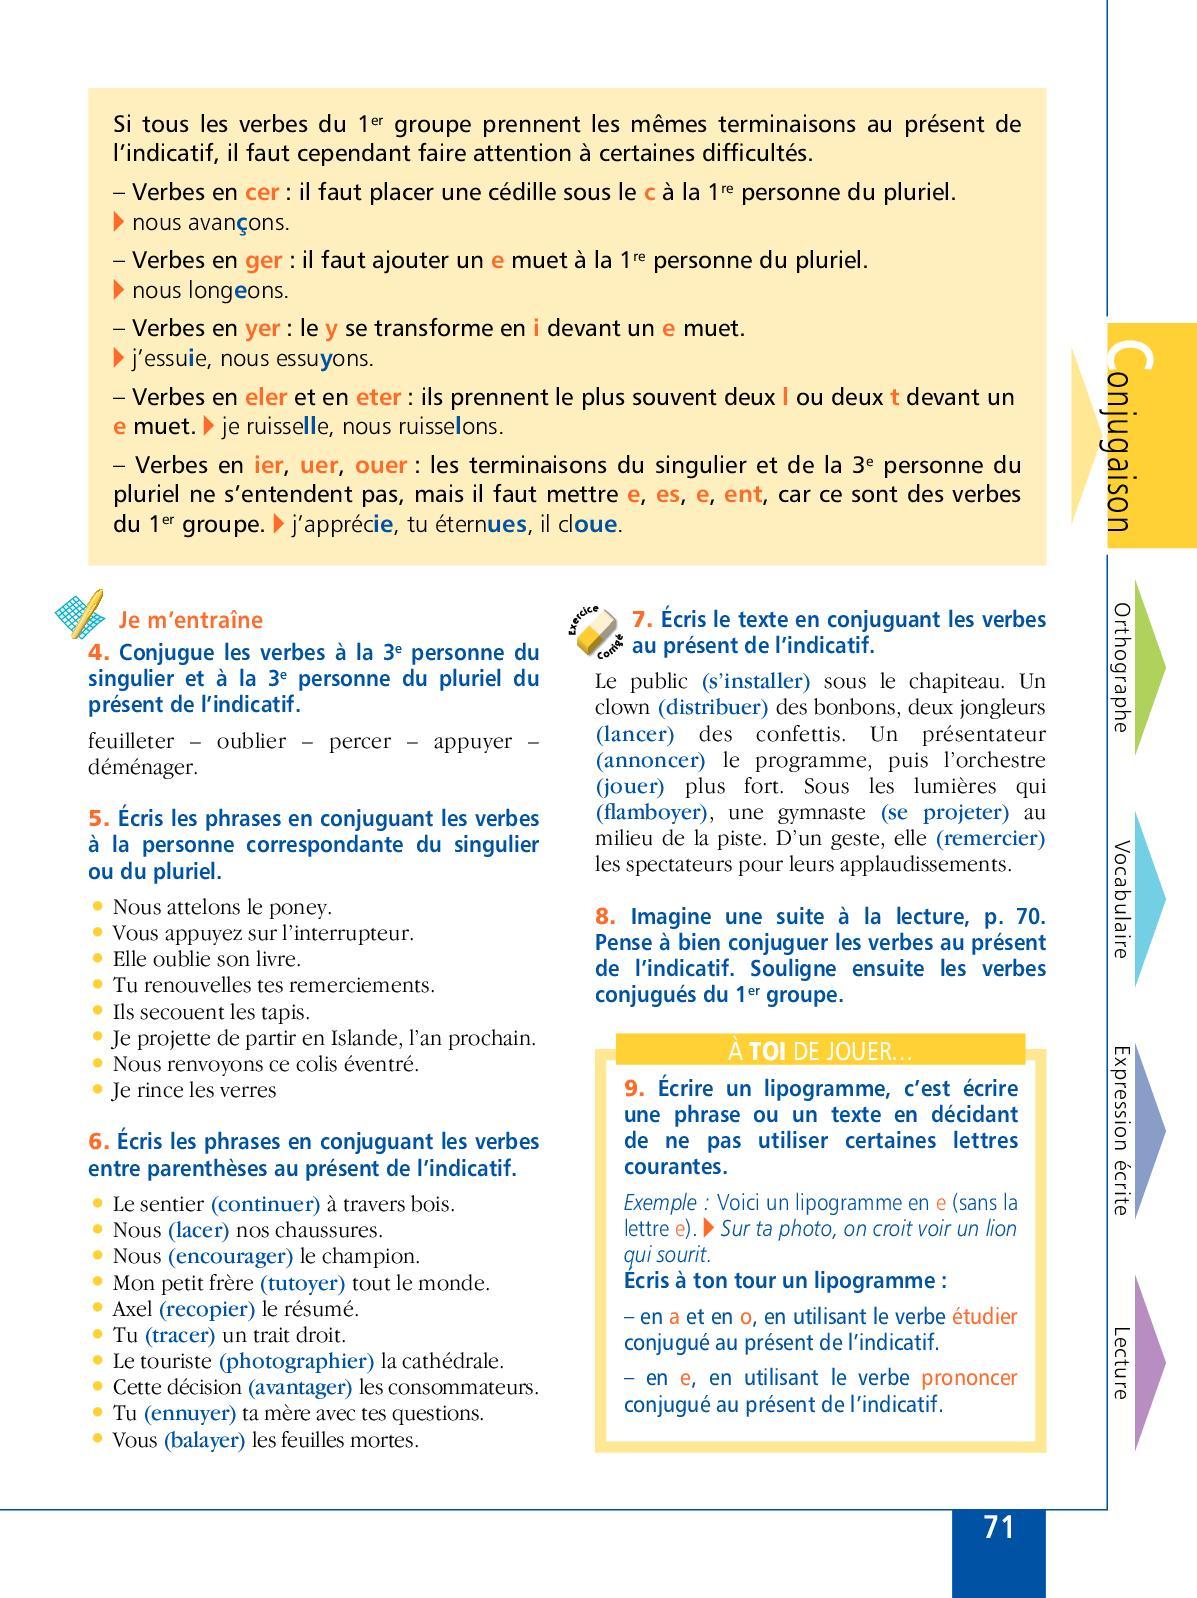 A Portee De Mots Cm1 Edition 2009 Calameo Downloader